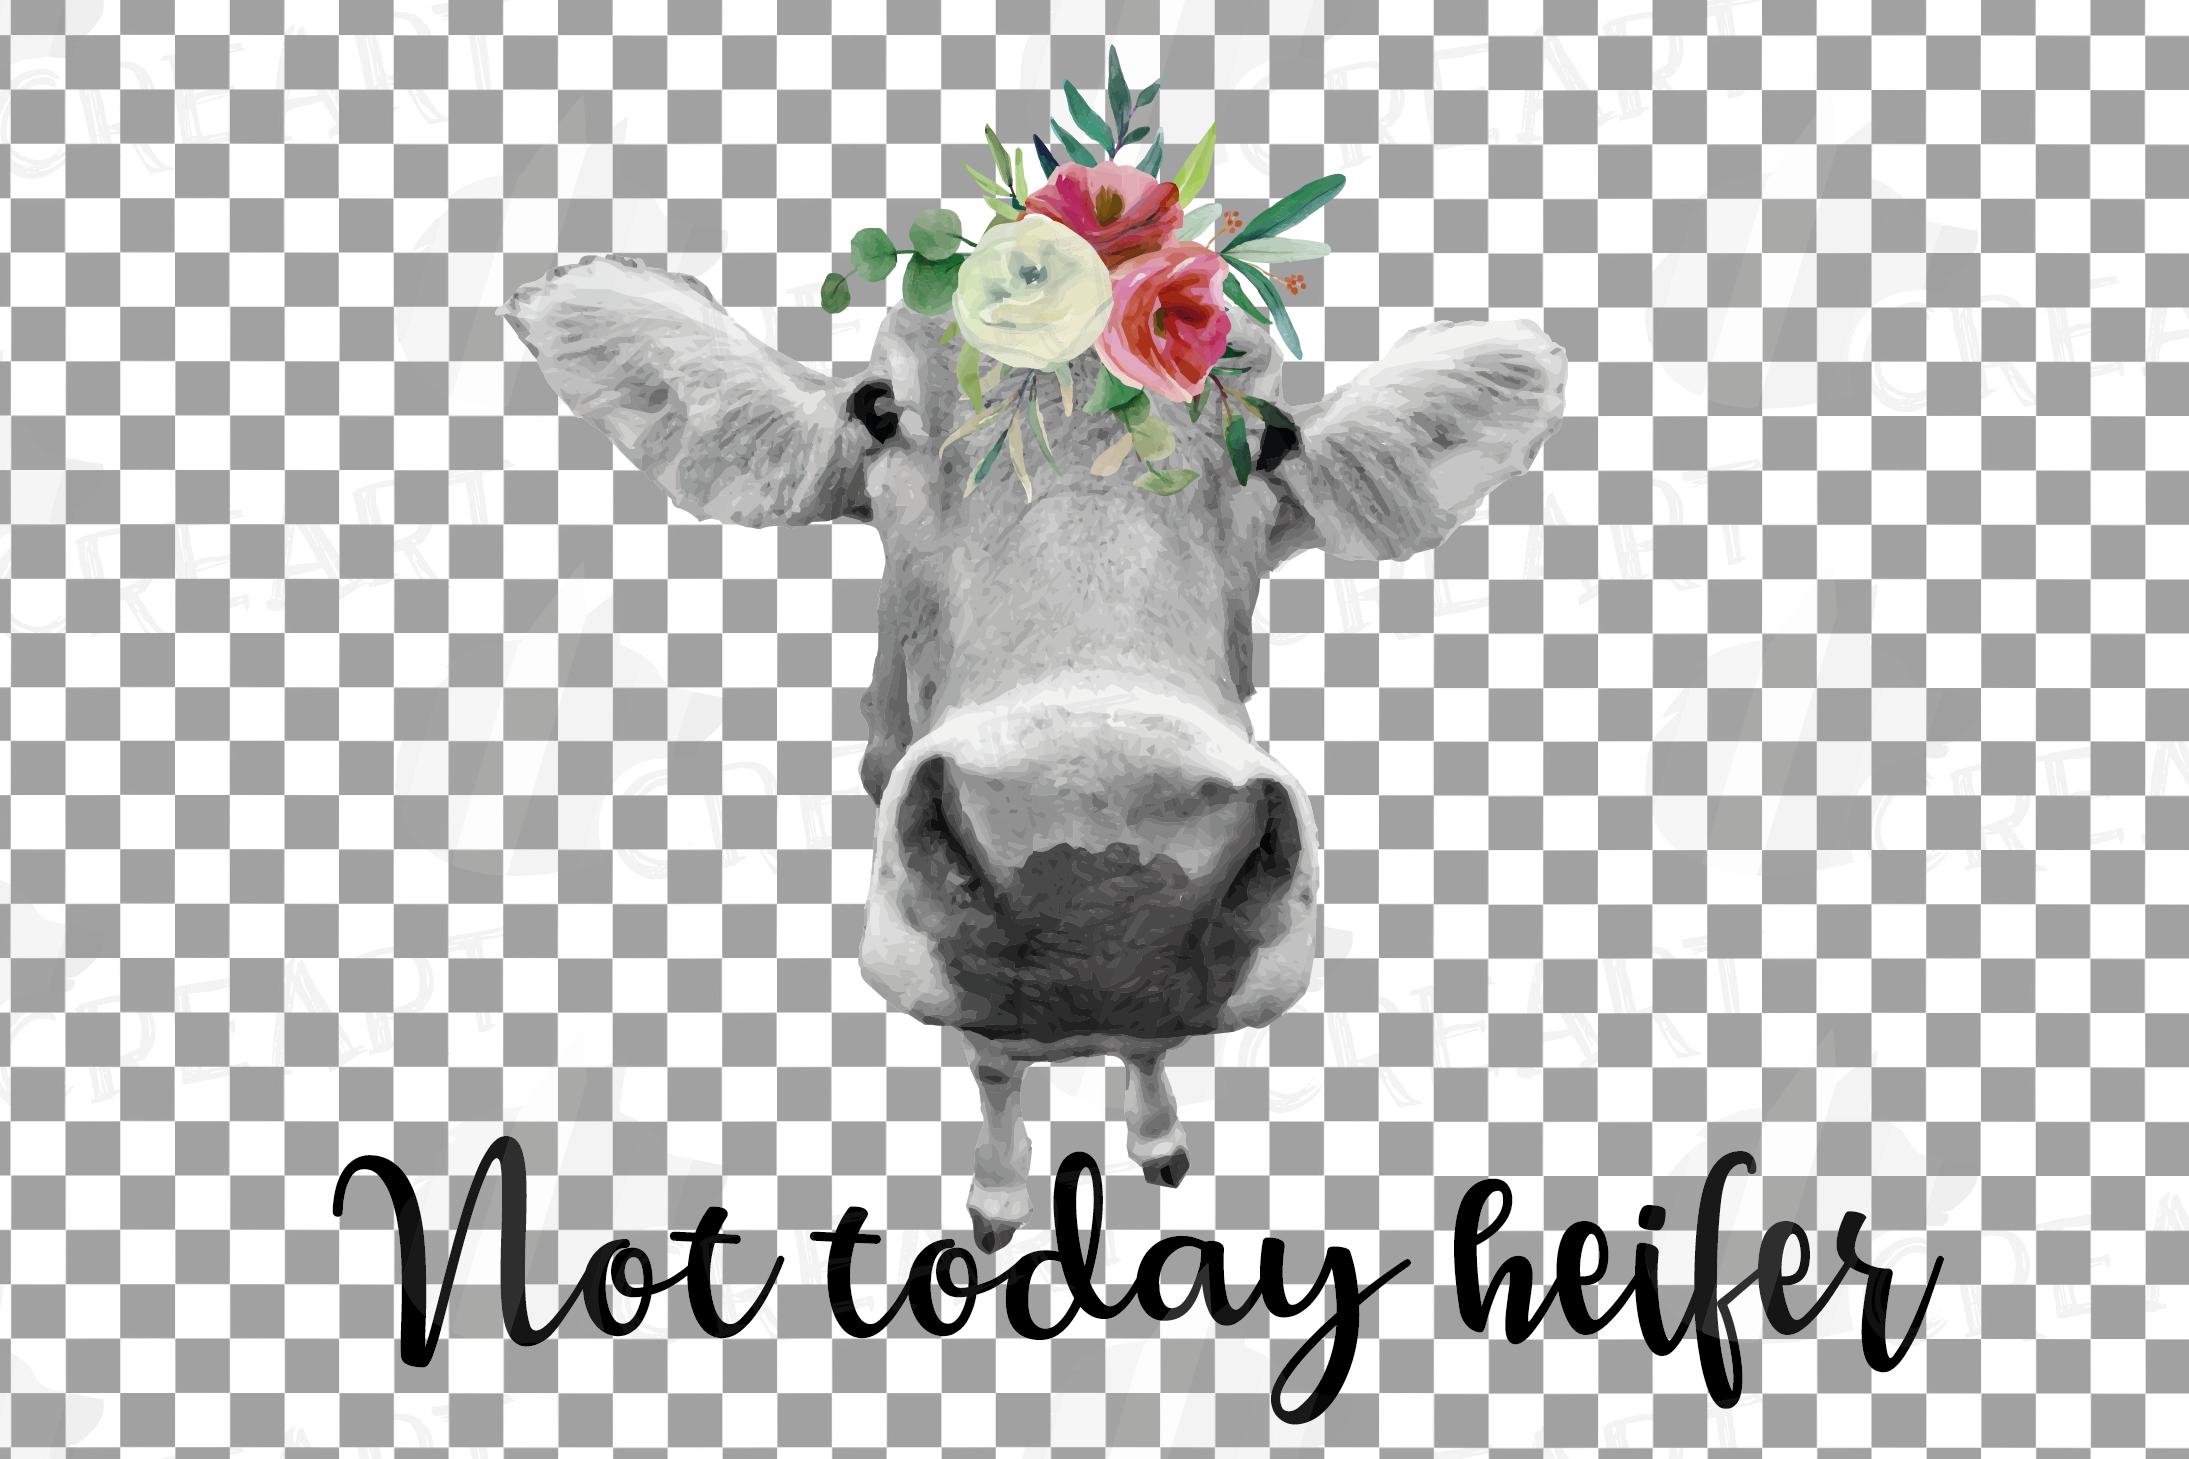 Not today Heifer printable shirt, mug, card floral cow png example image 15